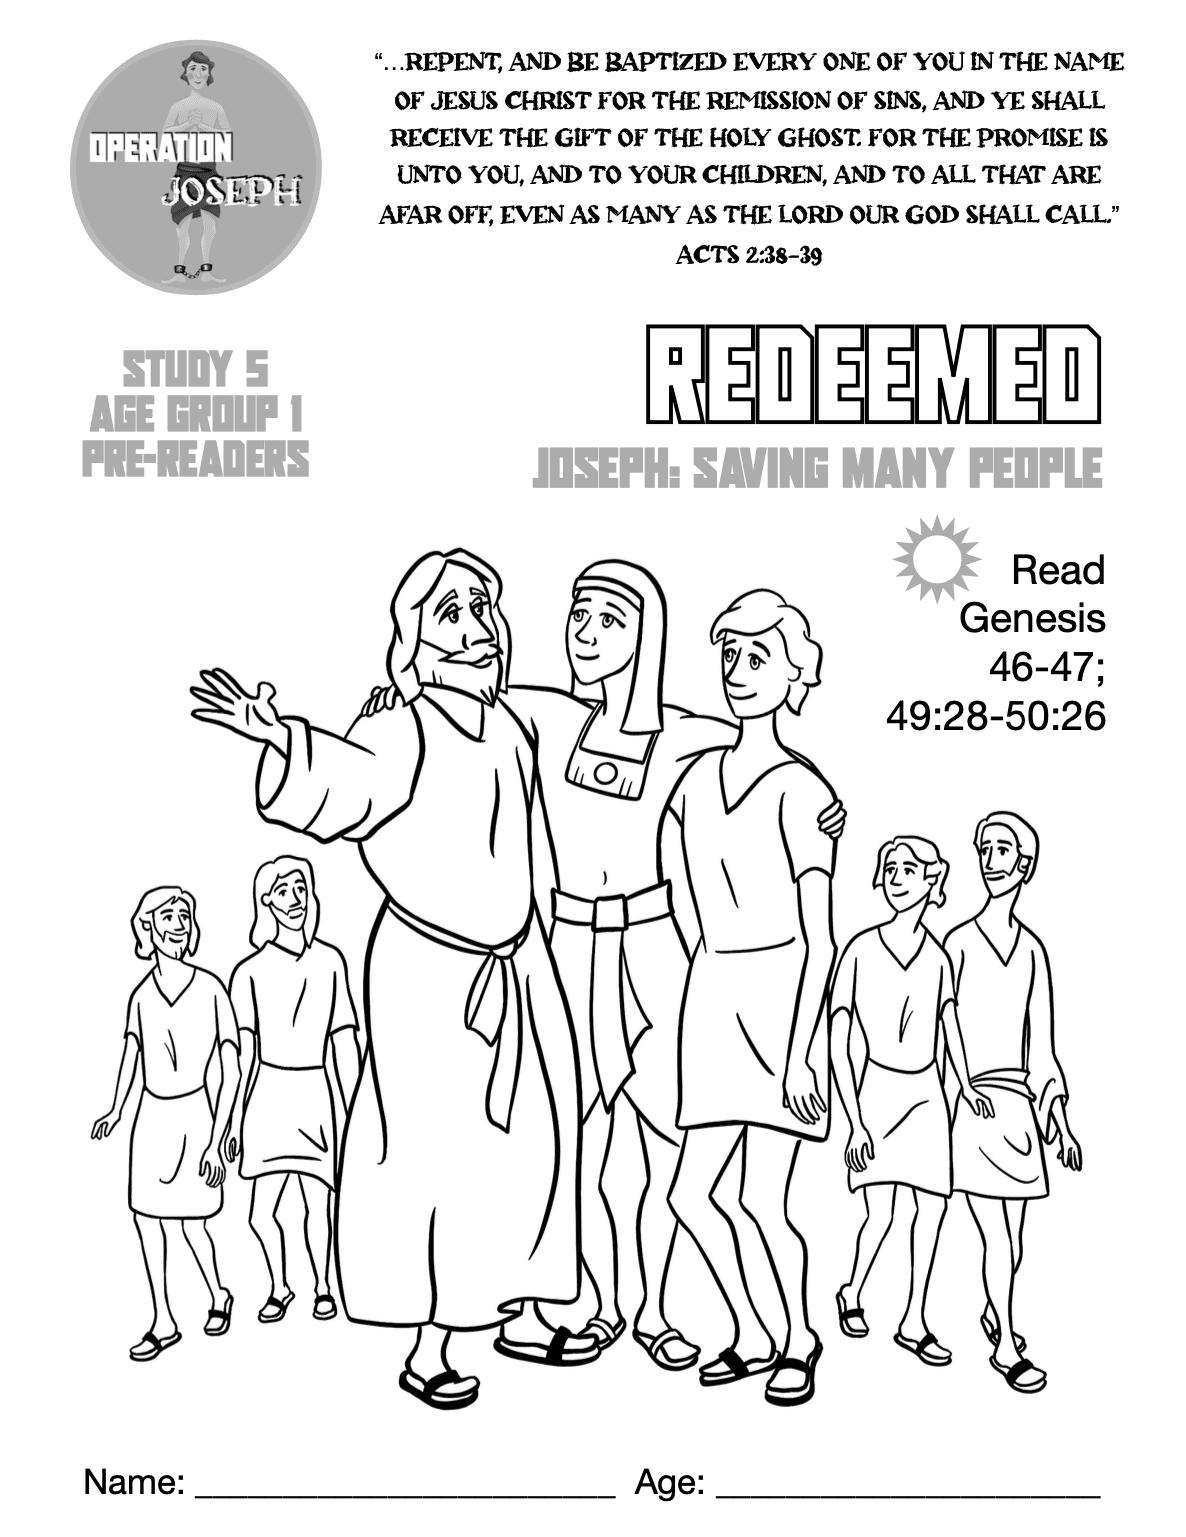 Operation Joseph - Study 5 - Pre-readers